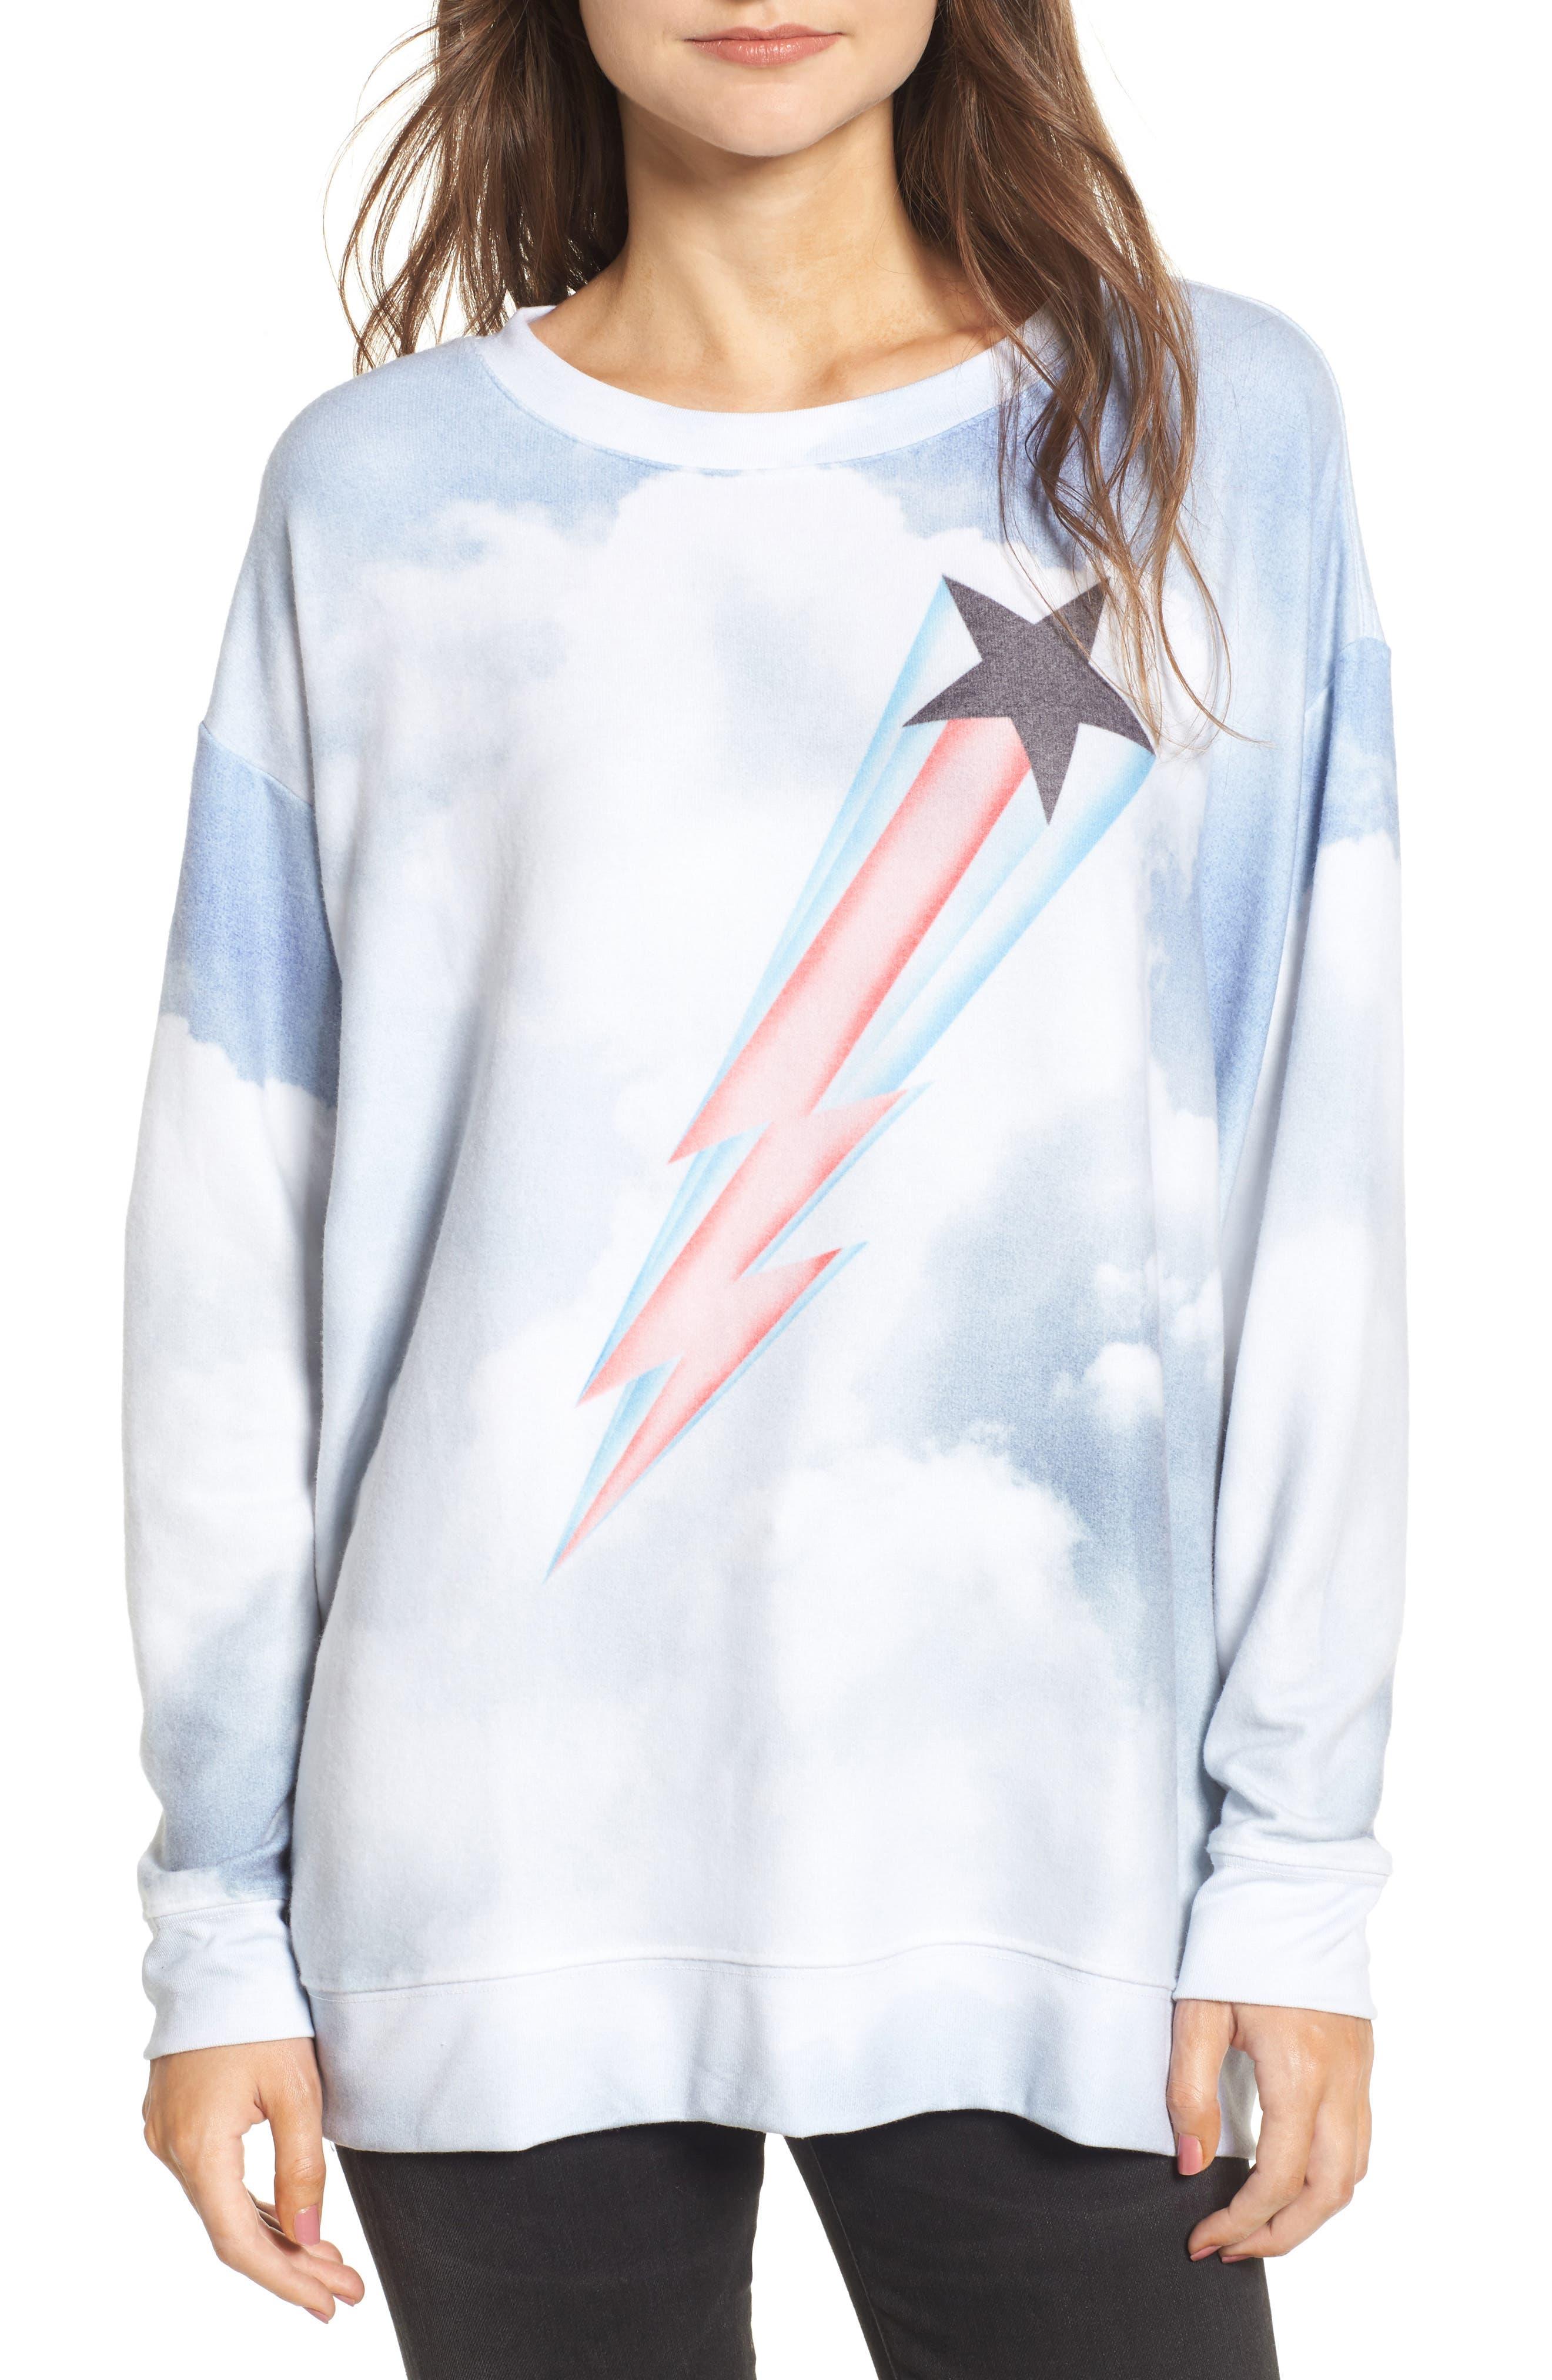 Heavens Roadtrip Sweatshirt,                             Main thumbnail 1, color,                             Multi